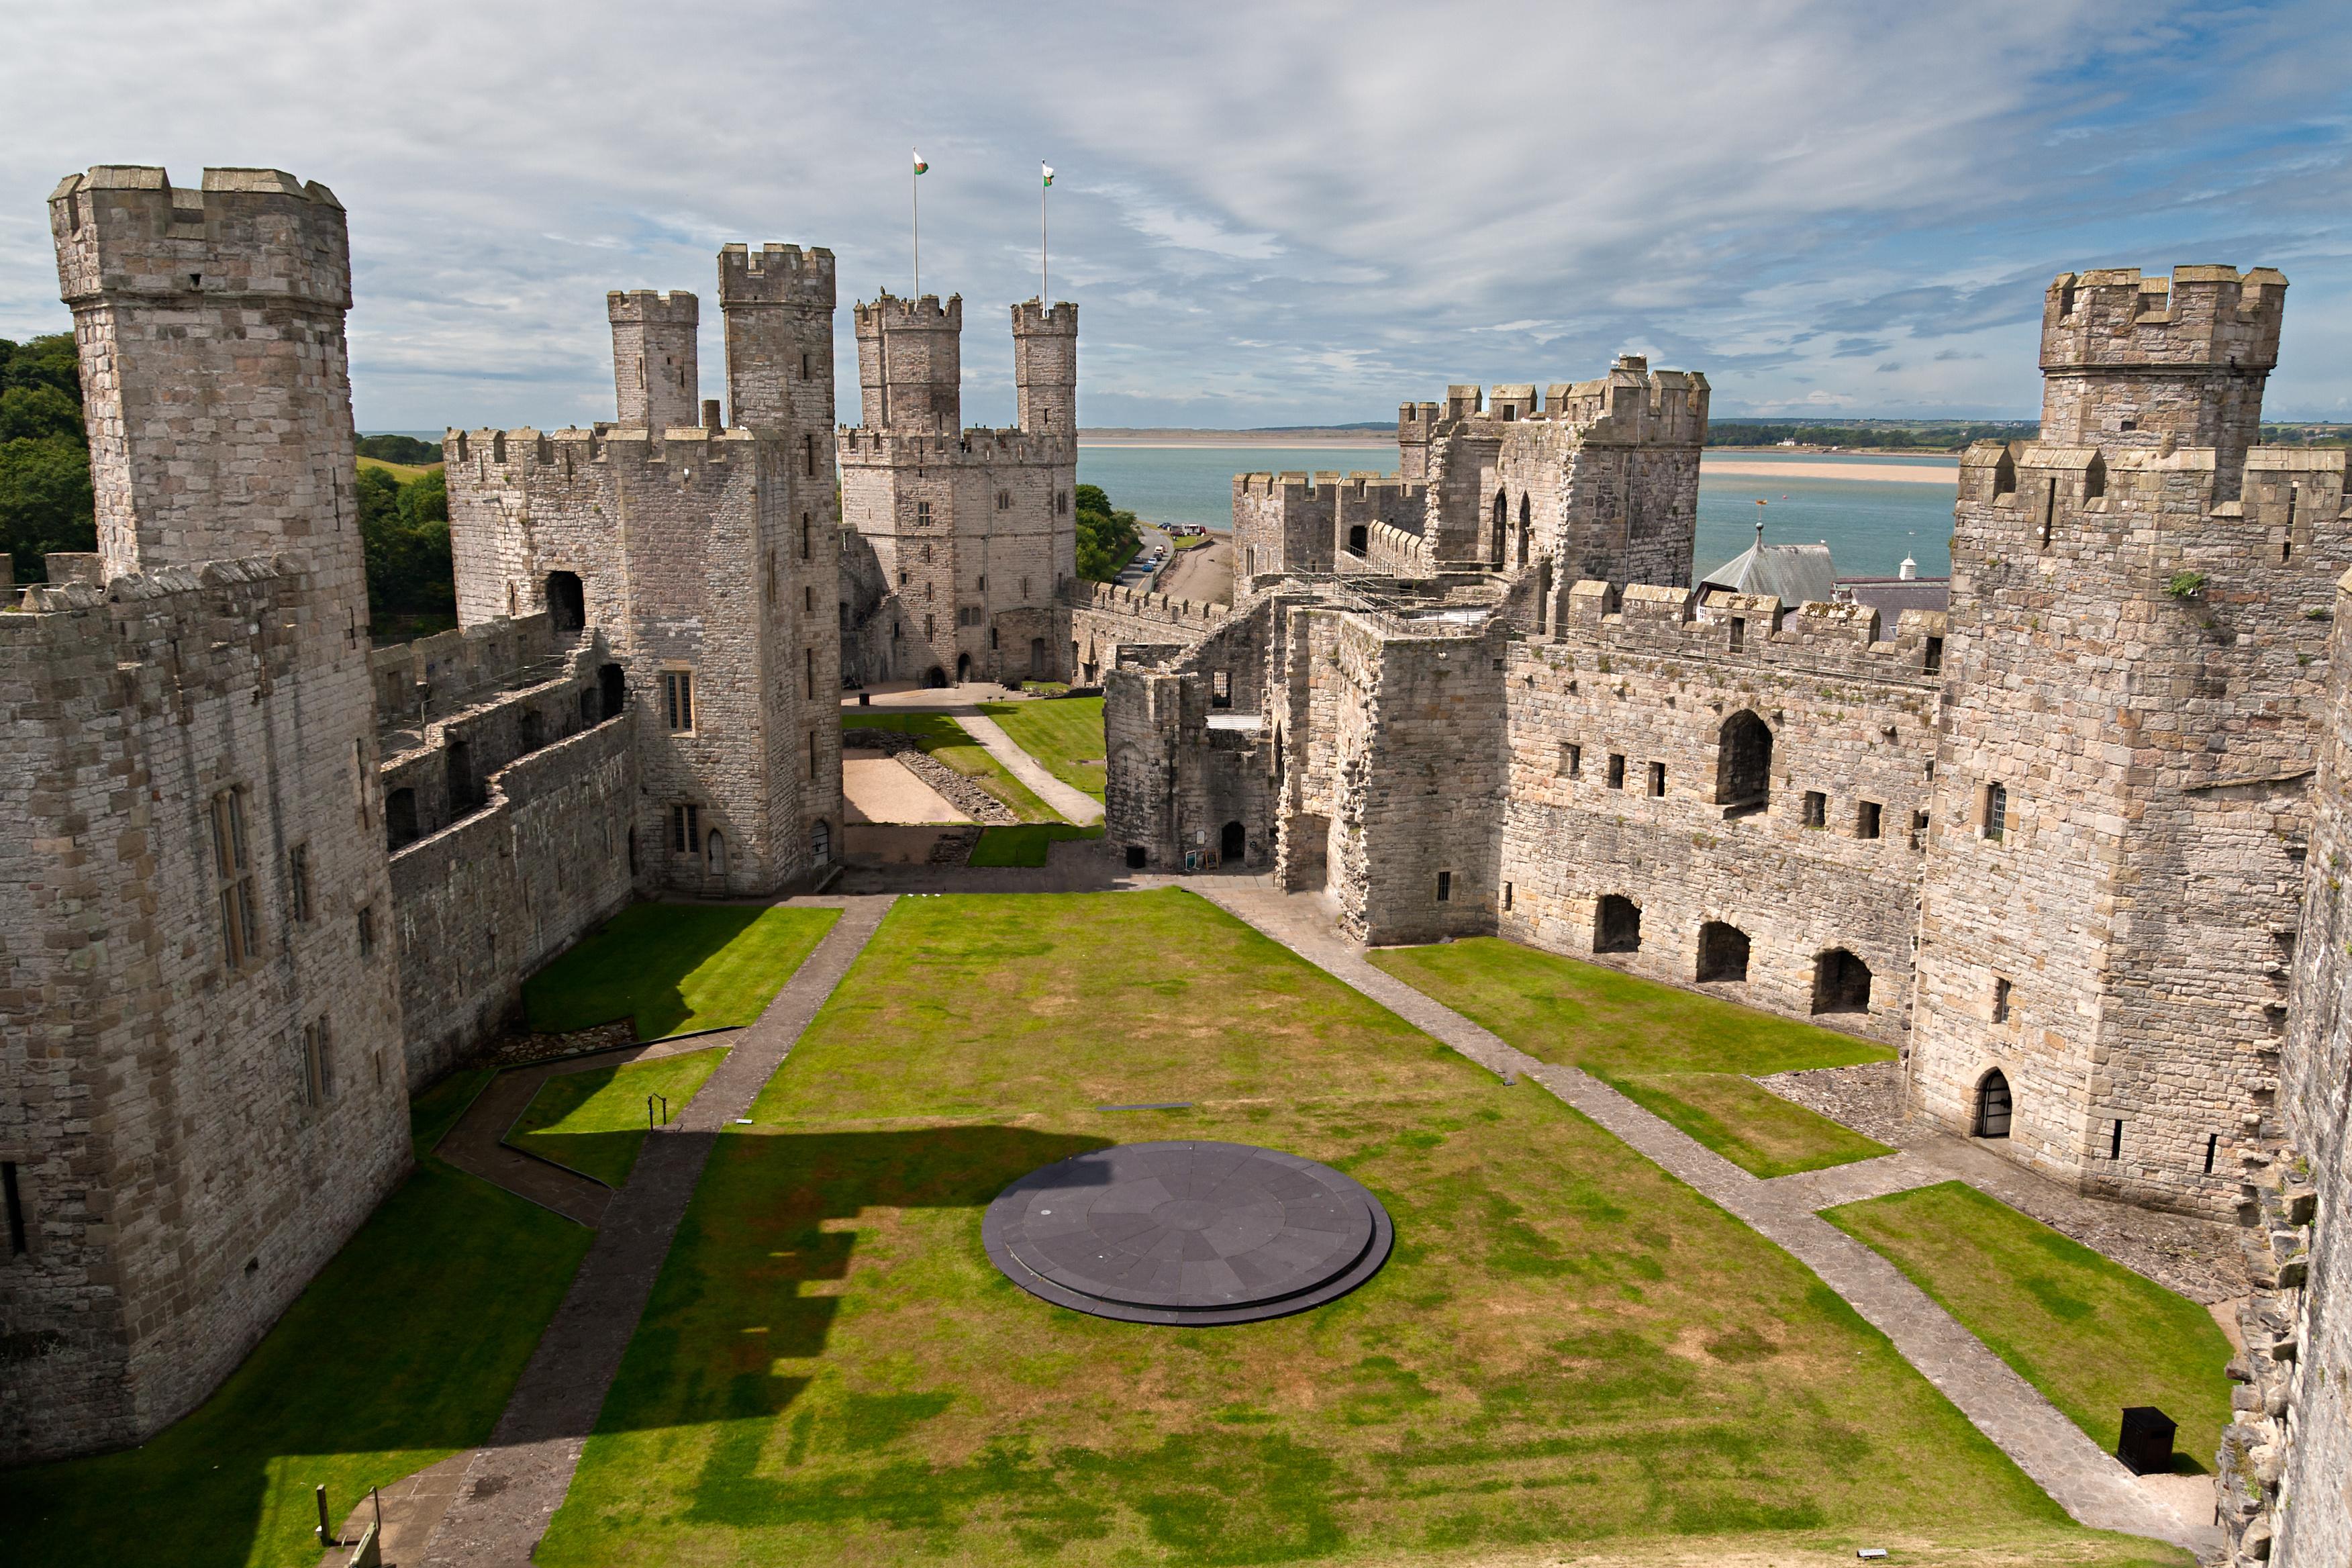 https://assets.eberhardt-travel.de/2016/Grossbritannien/49710_Caernarfon_Castle_in_Snowdonia_-_Wales_Original.jpg